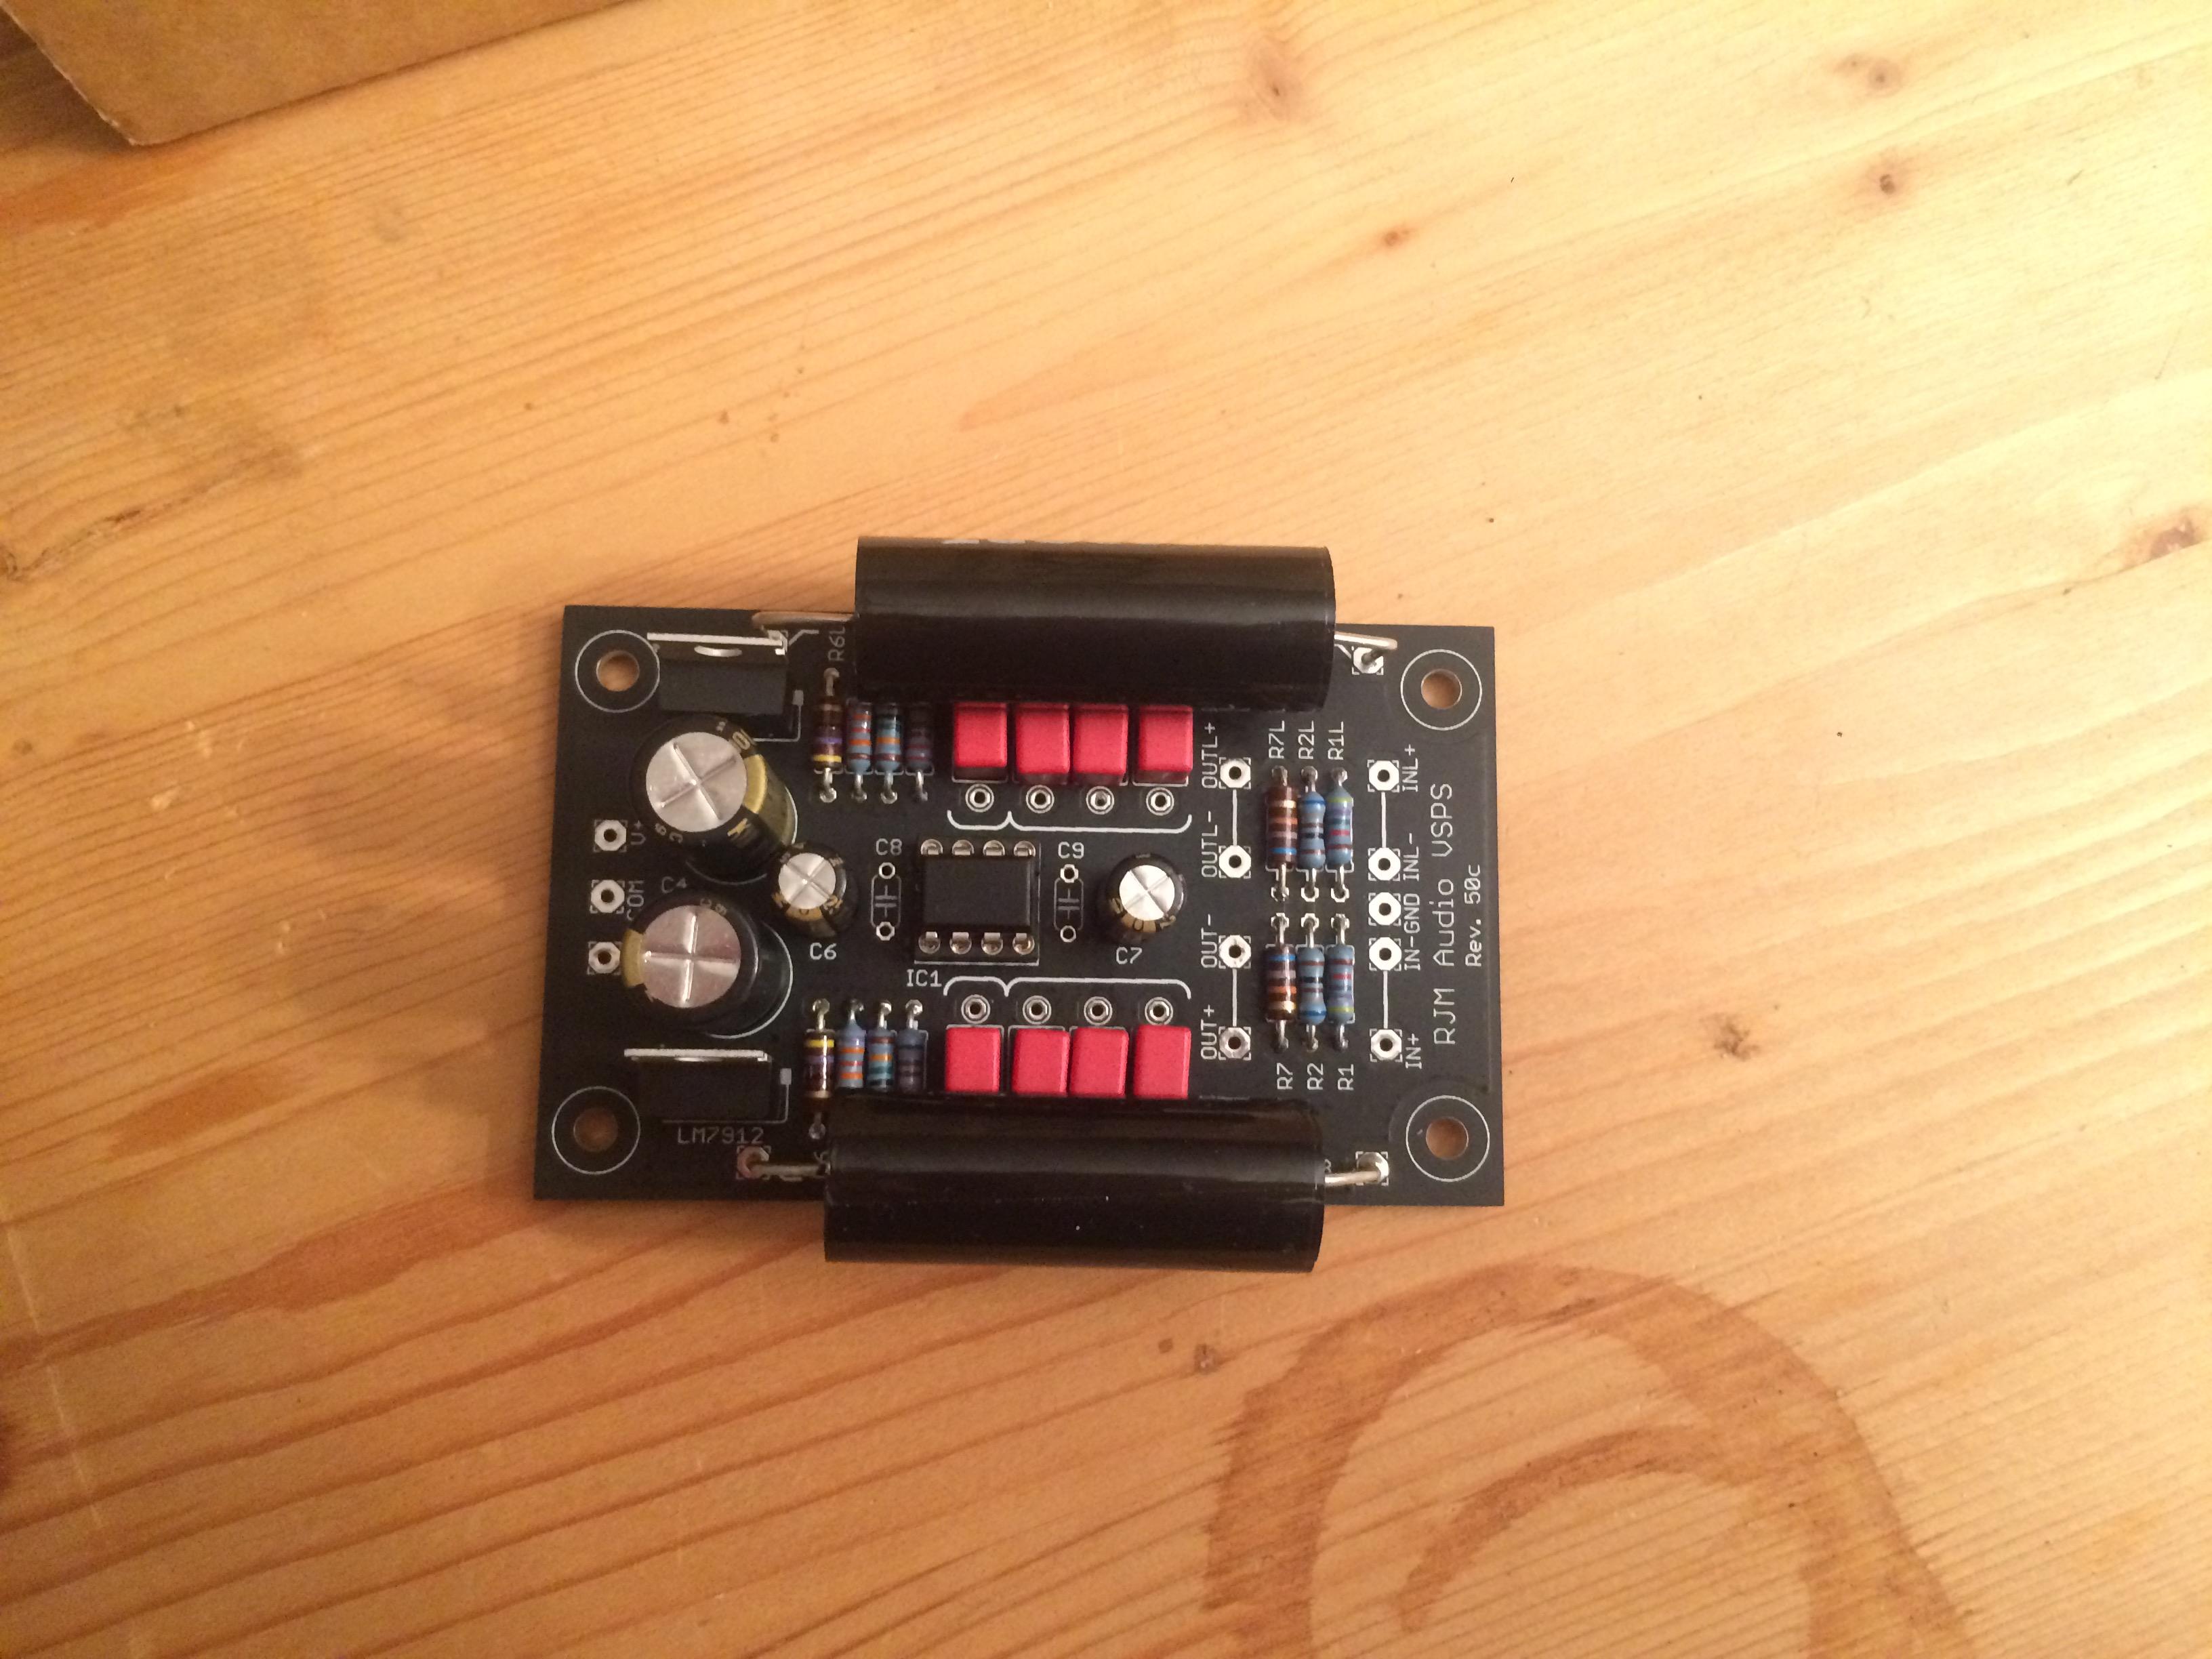 Bautagebuch: DIY-Stereoverstärker - Seite 3